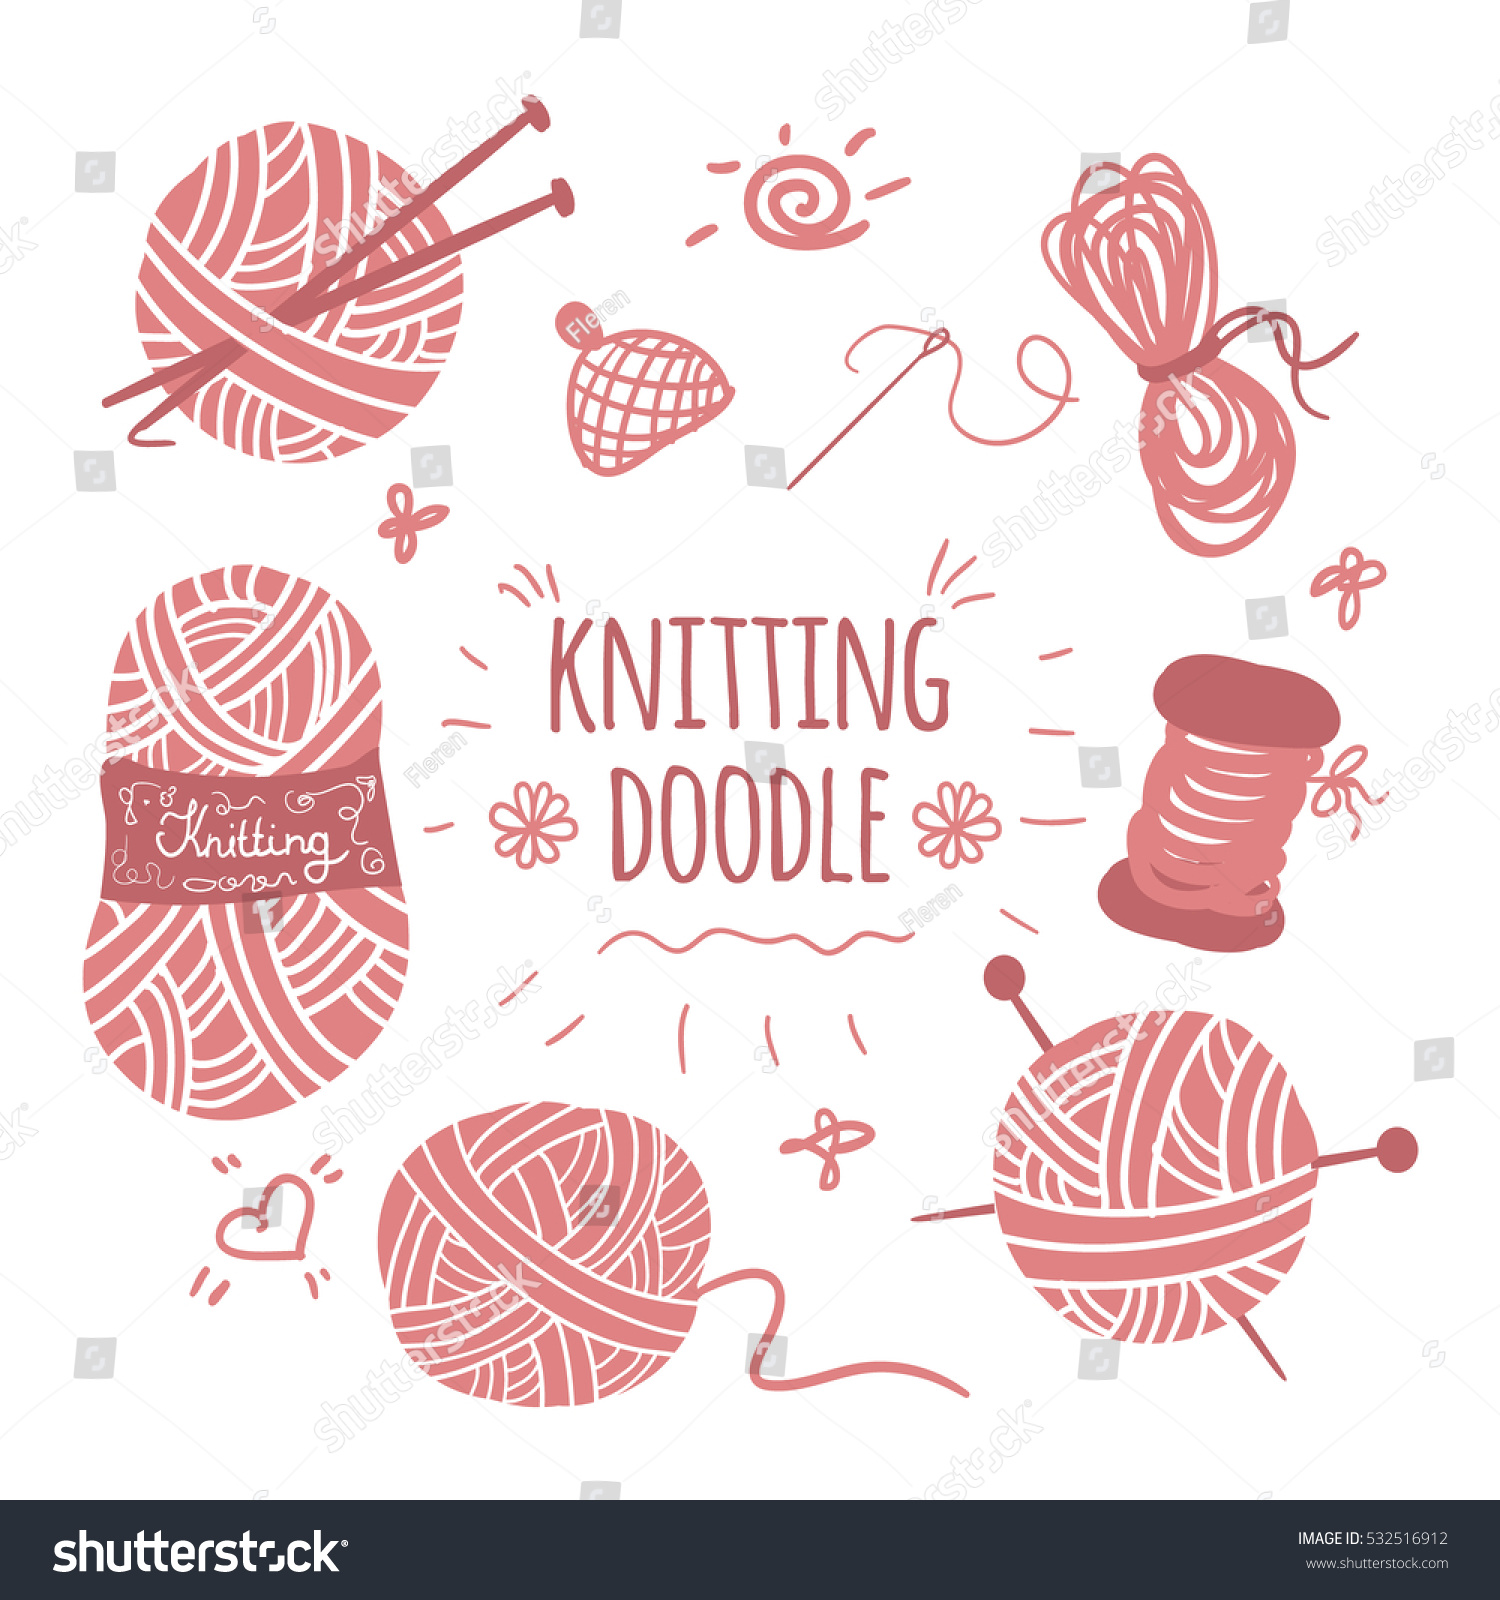 Knitting Font Free Download : Knitting doodle icons set logos stock vector